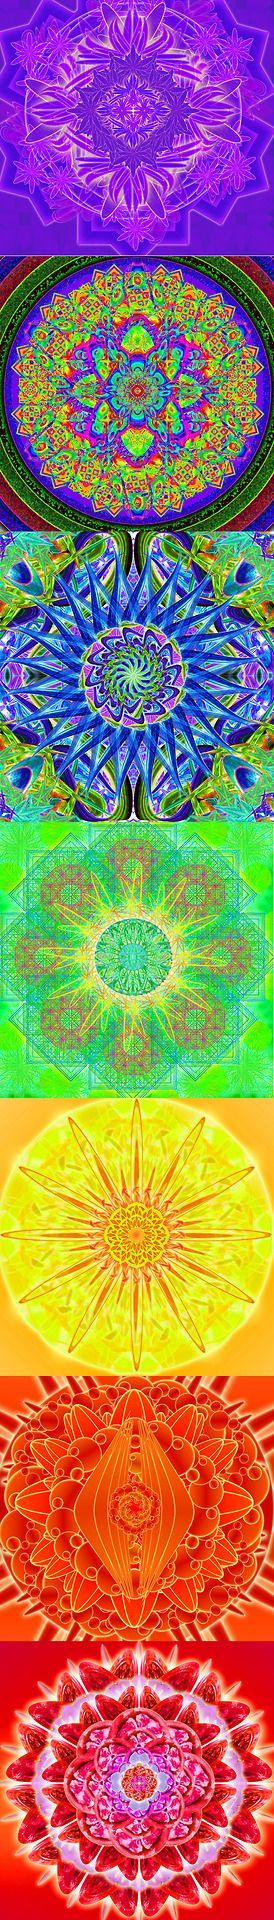 ⊰❁⊱ Mandalas ⊰❁⊱ American Hippie - 7 Chakras Mandala para Curar todos sus Chakras